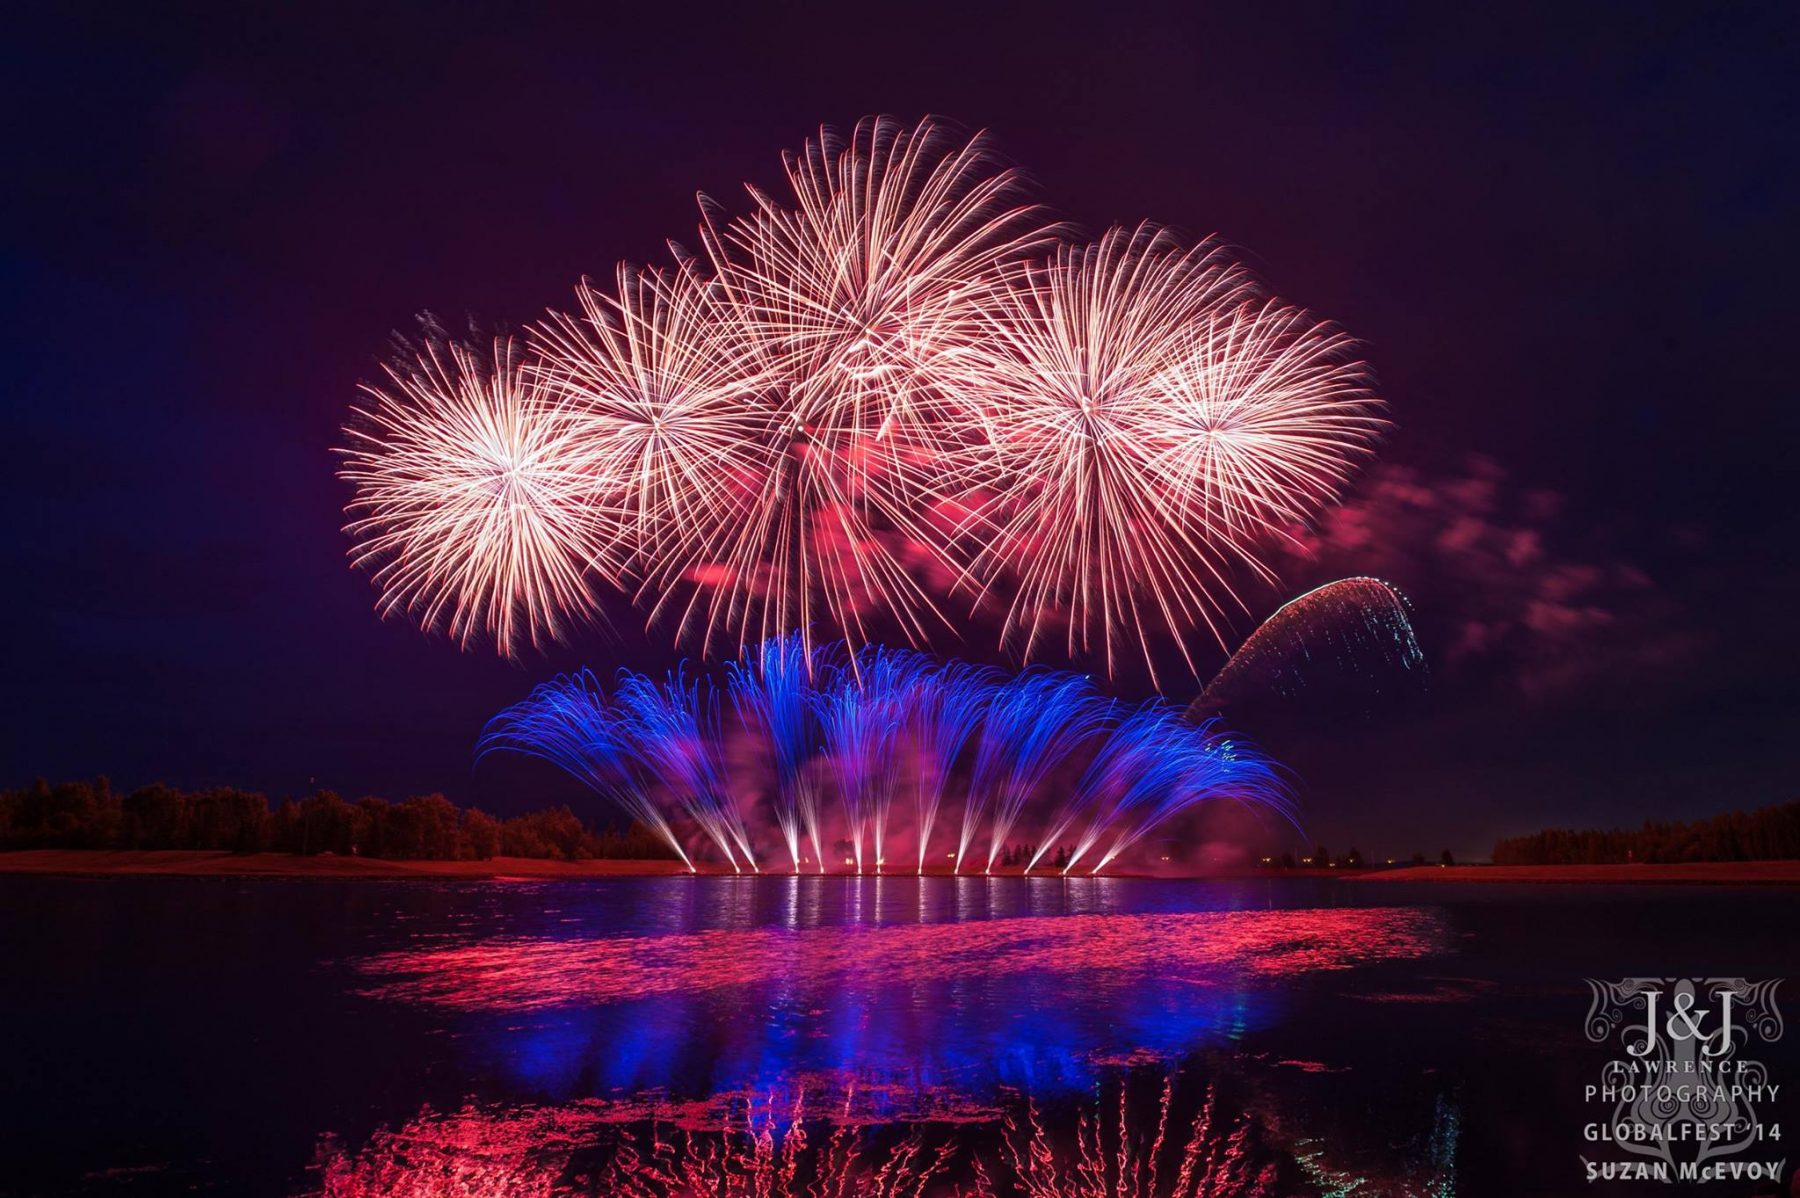 Image: GlobalFest - The Calgary Fireworks Festival Society / Facebook